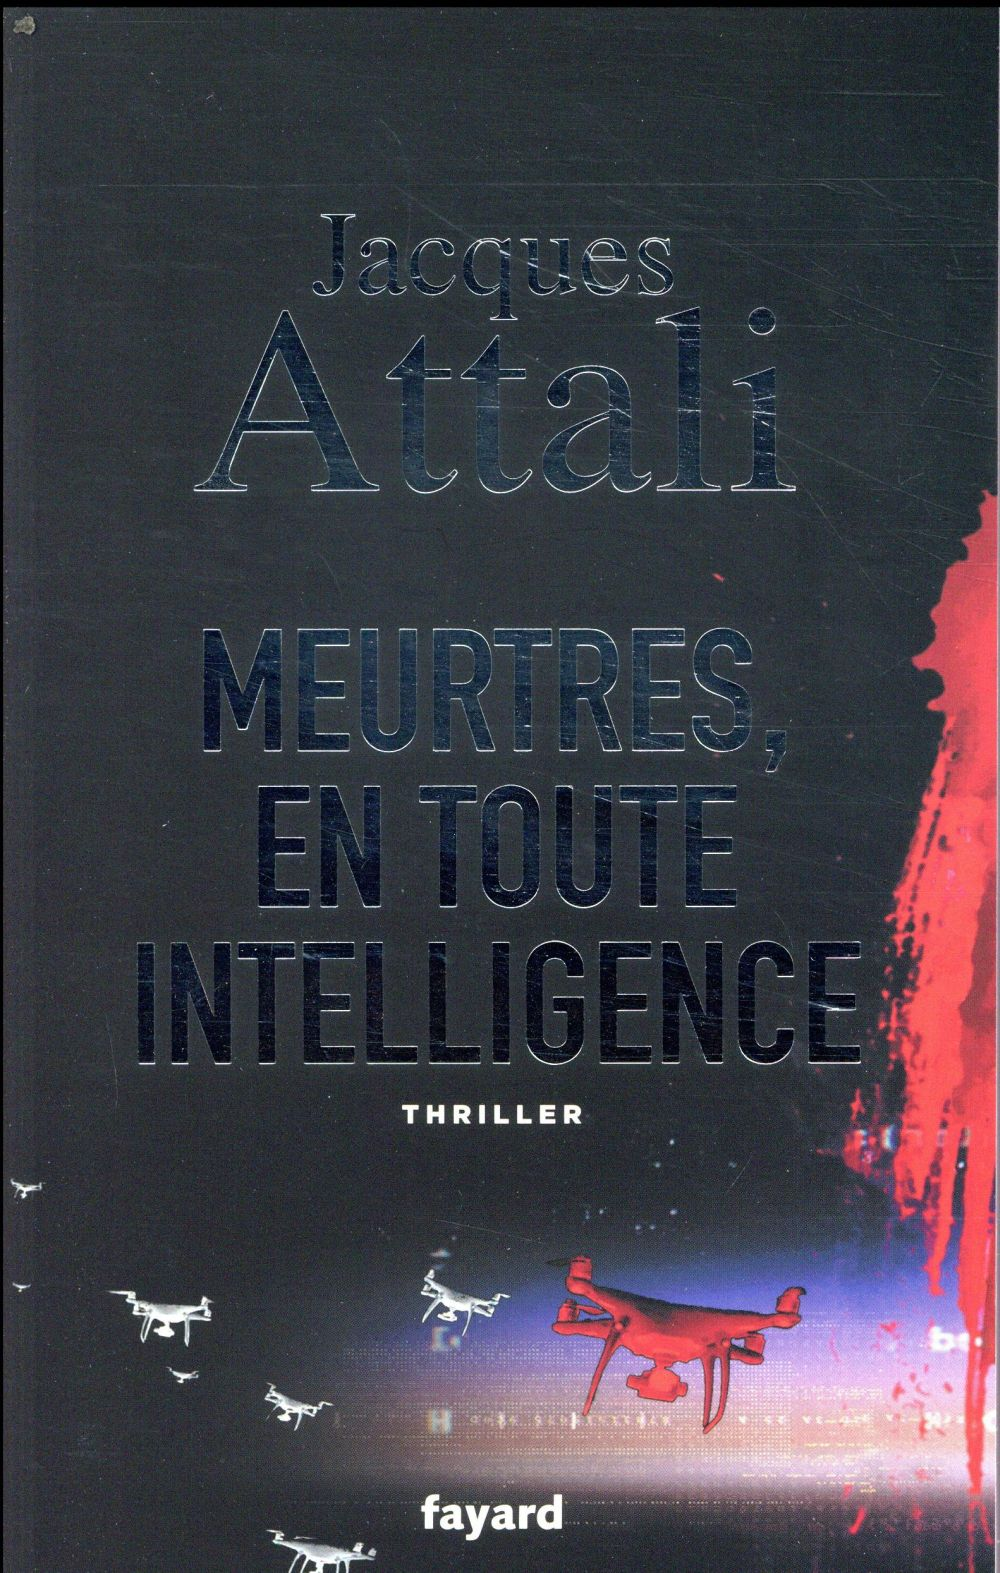 meurtres, en toute intelligence